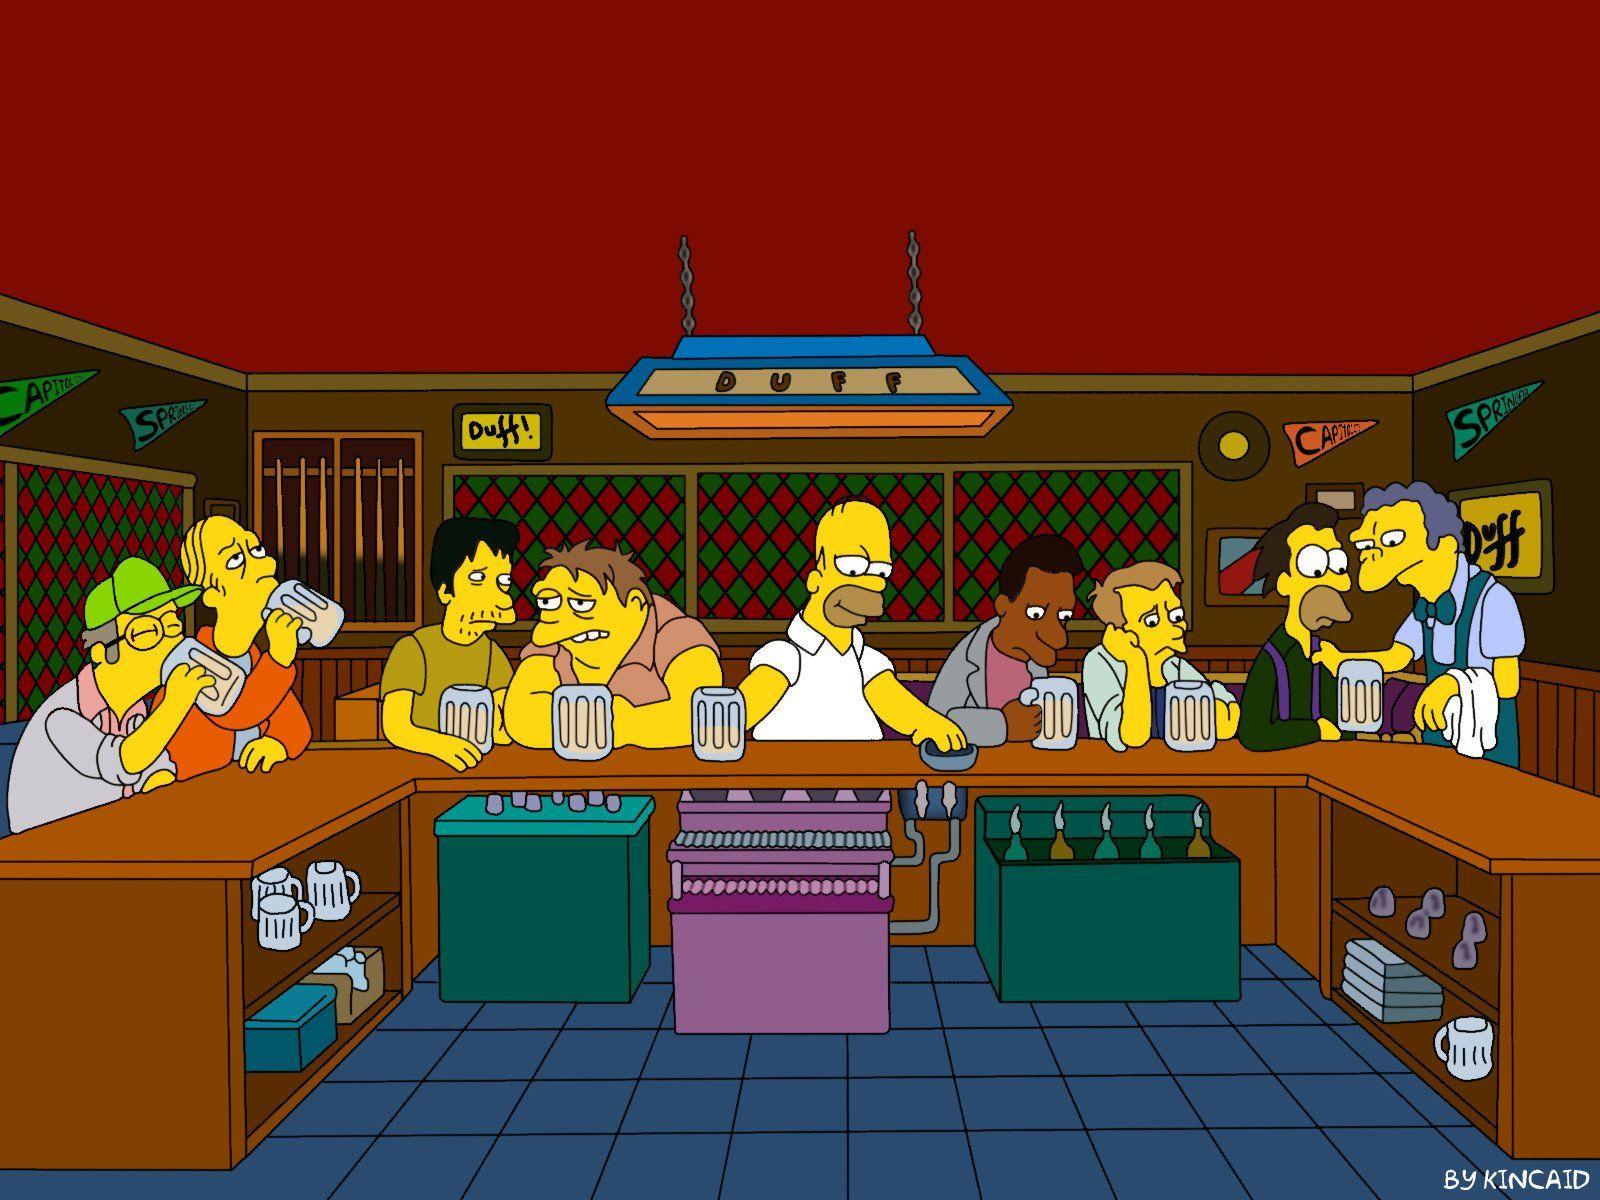 Poster The Simpsons Arte Simpsons Os Simpsons Wallpaper De